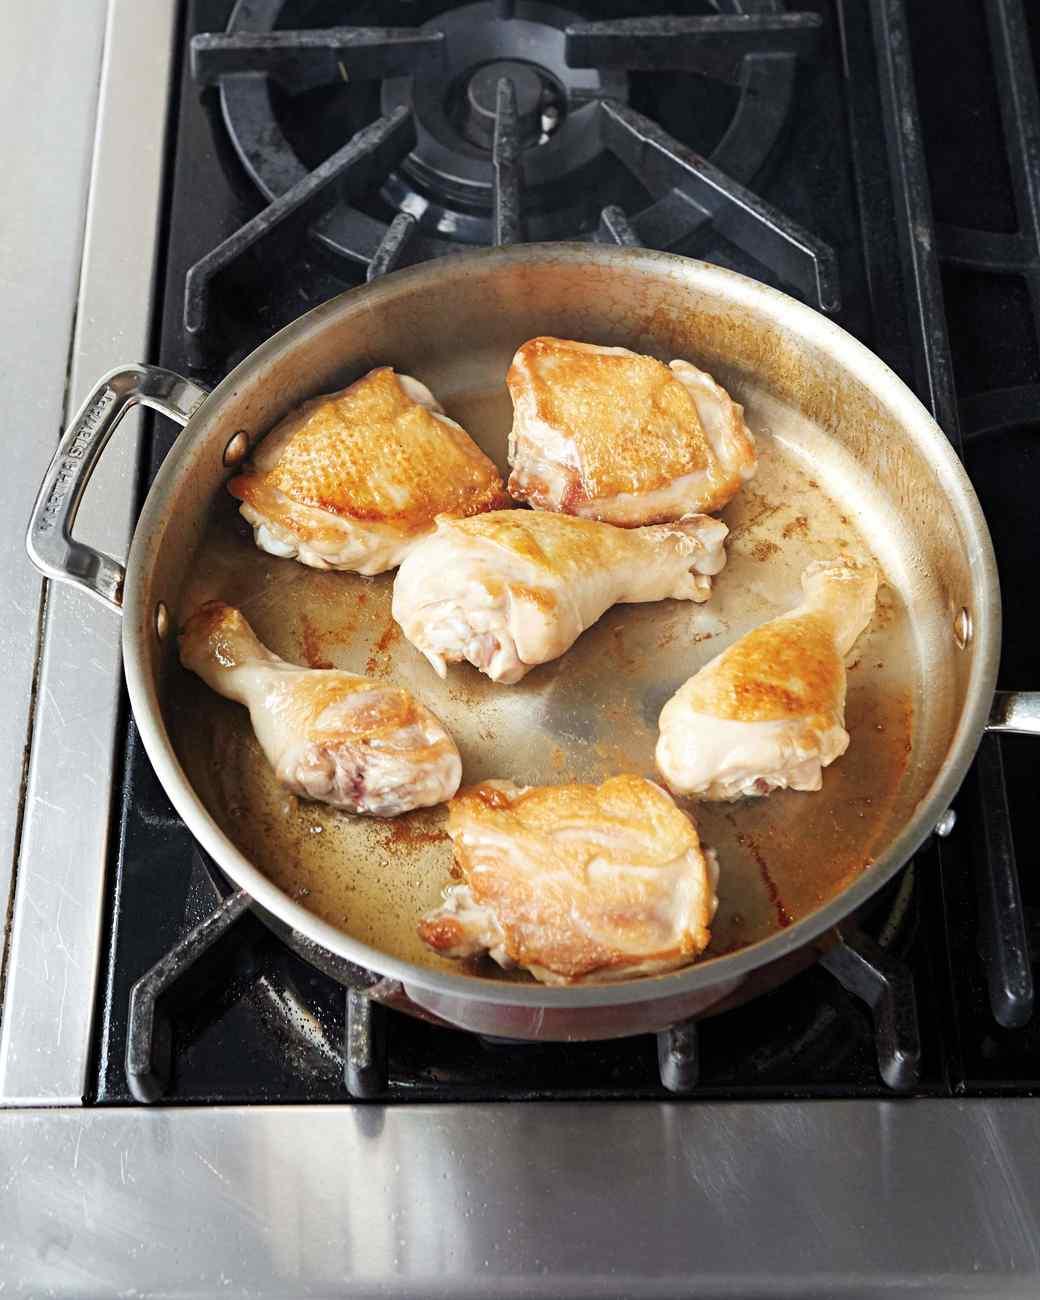 browning-chicken-139-d112734-0416.jpg